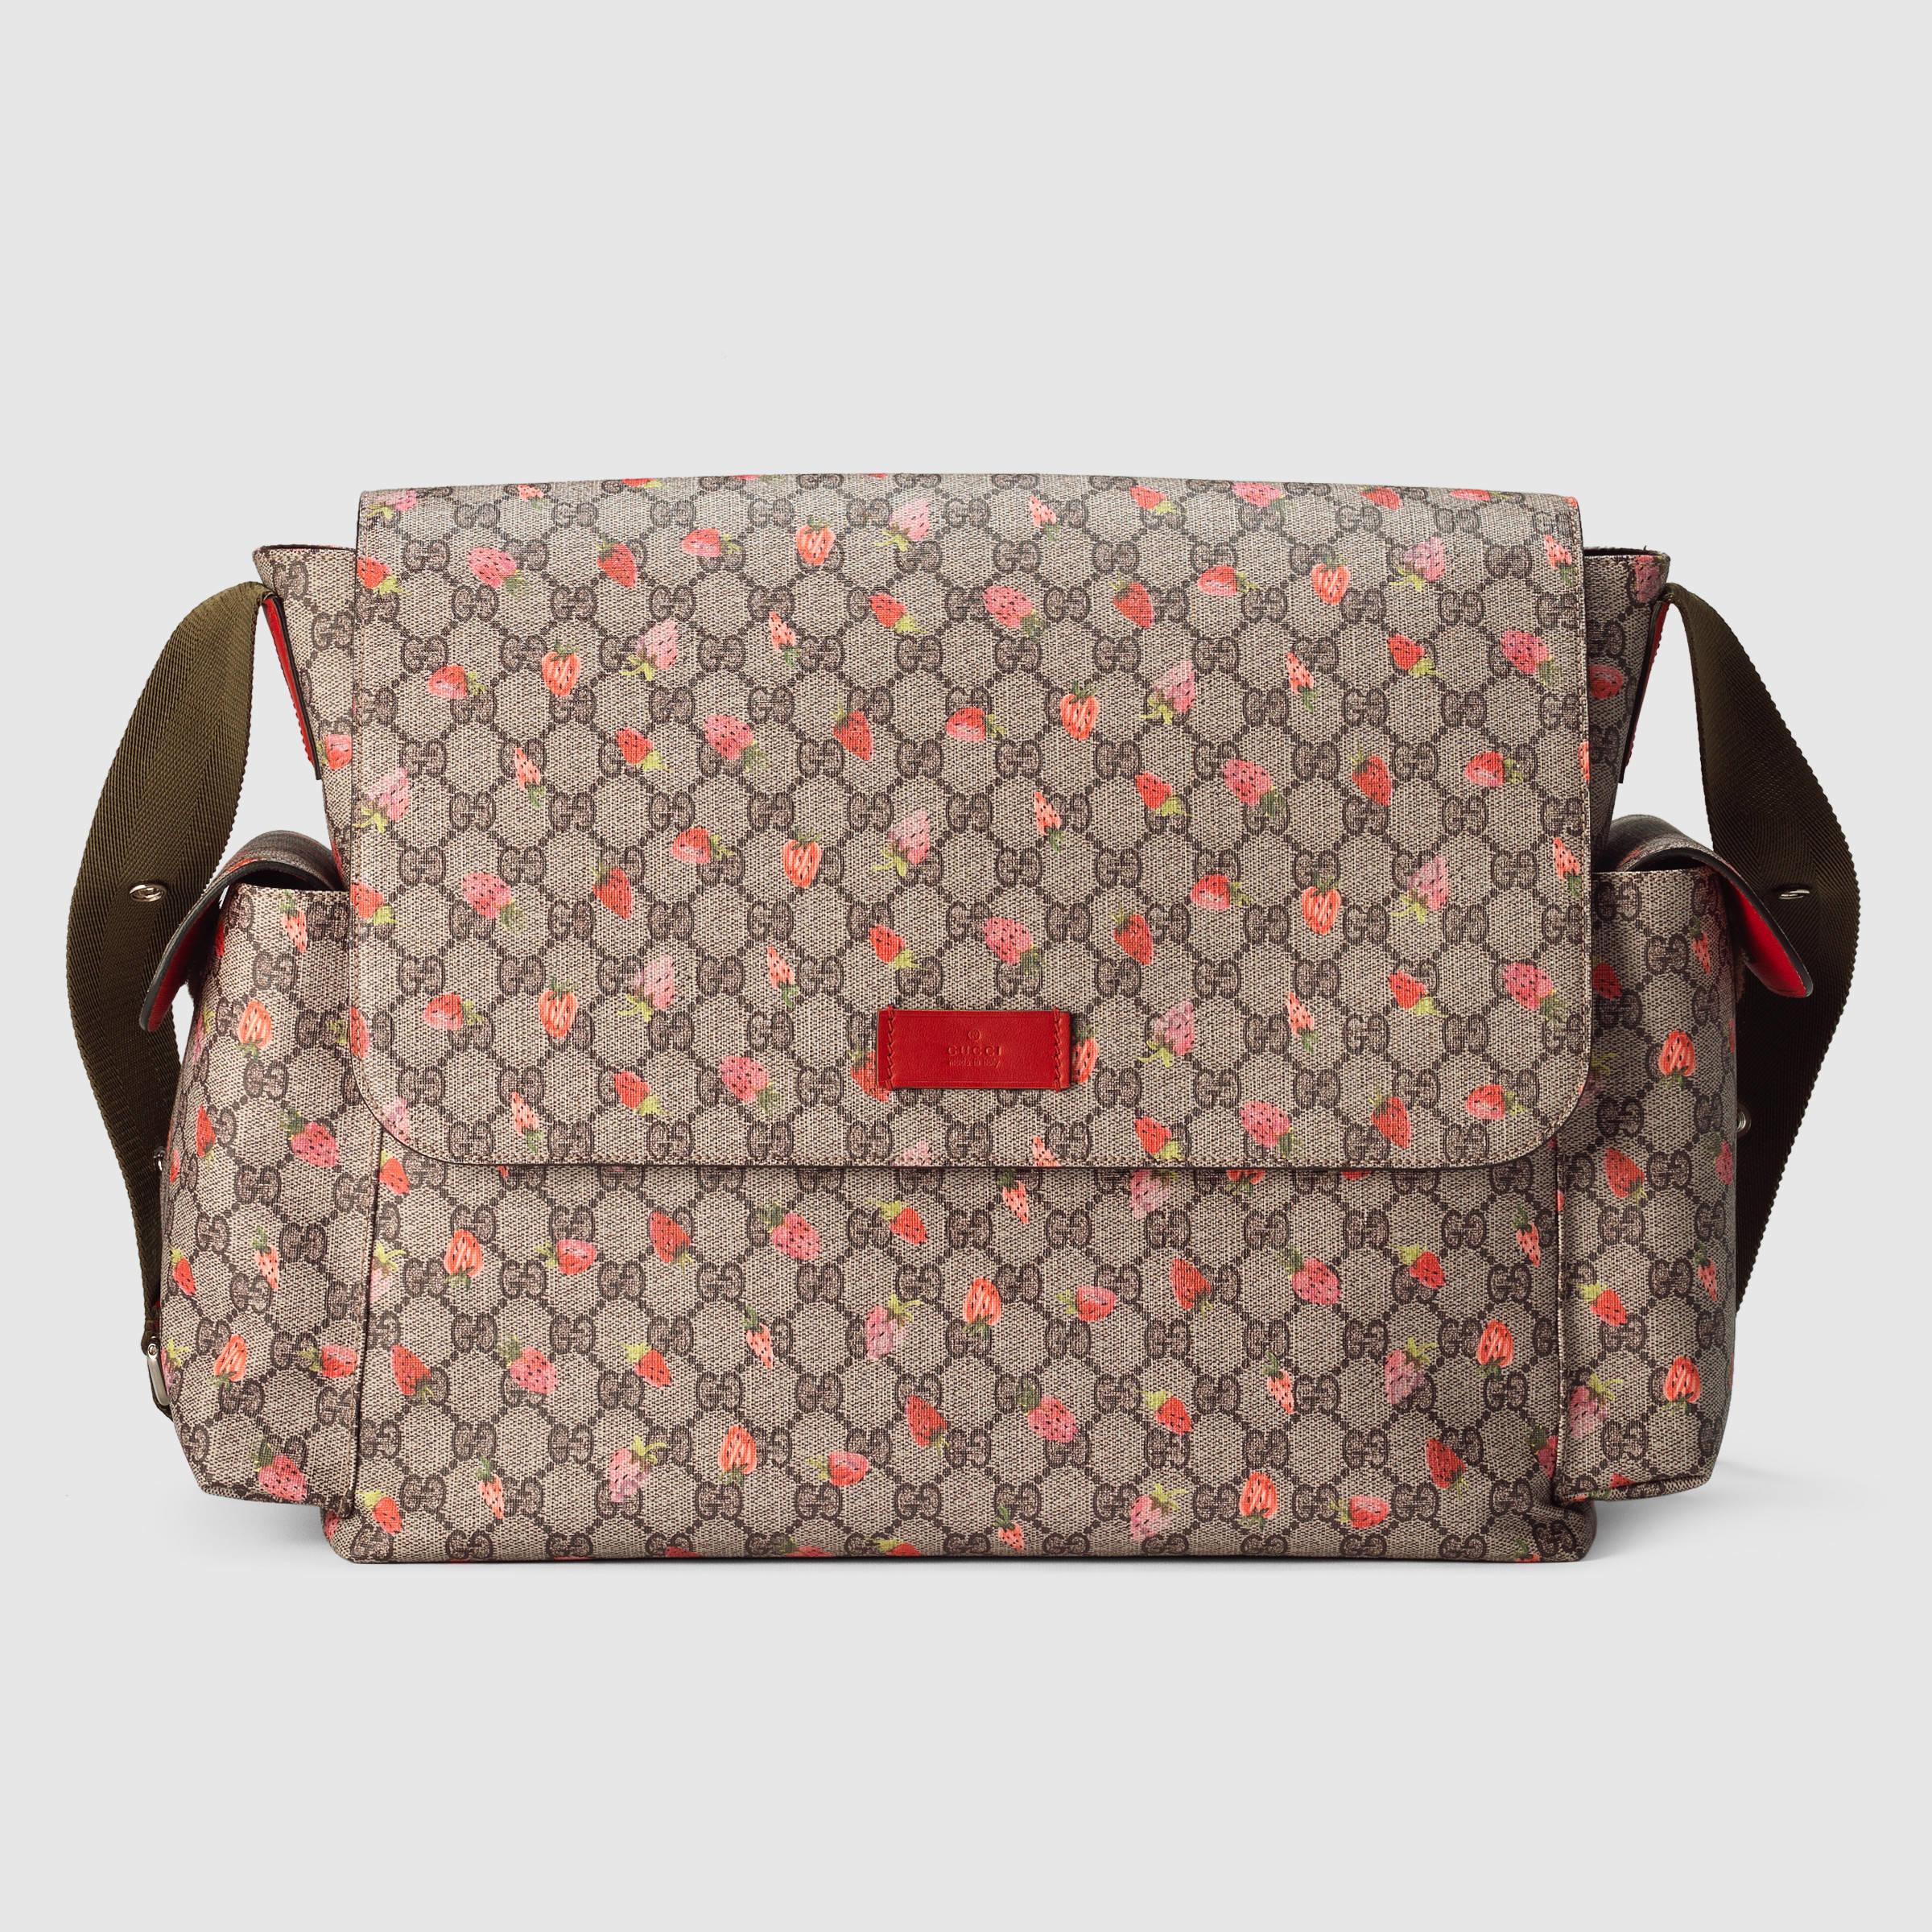 0e1b40f91ccb Gucci Gg Strawberry Diaper Bag in Pink - Lyst